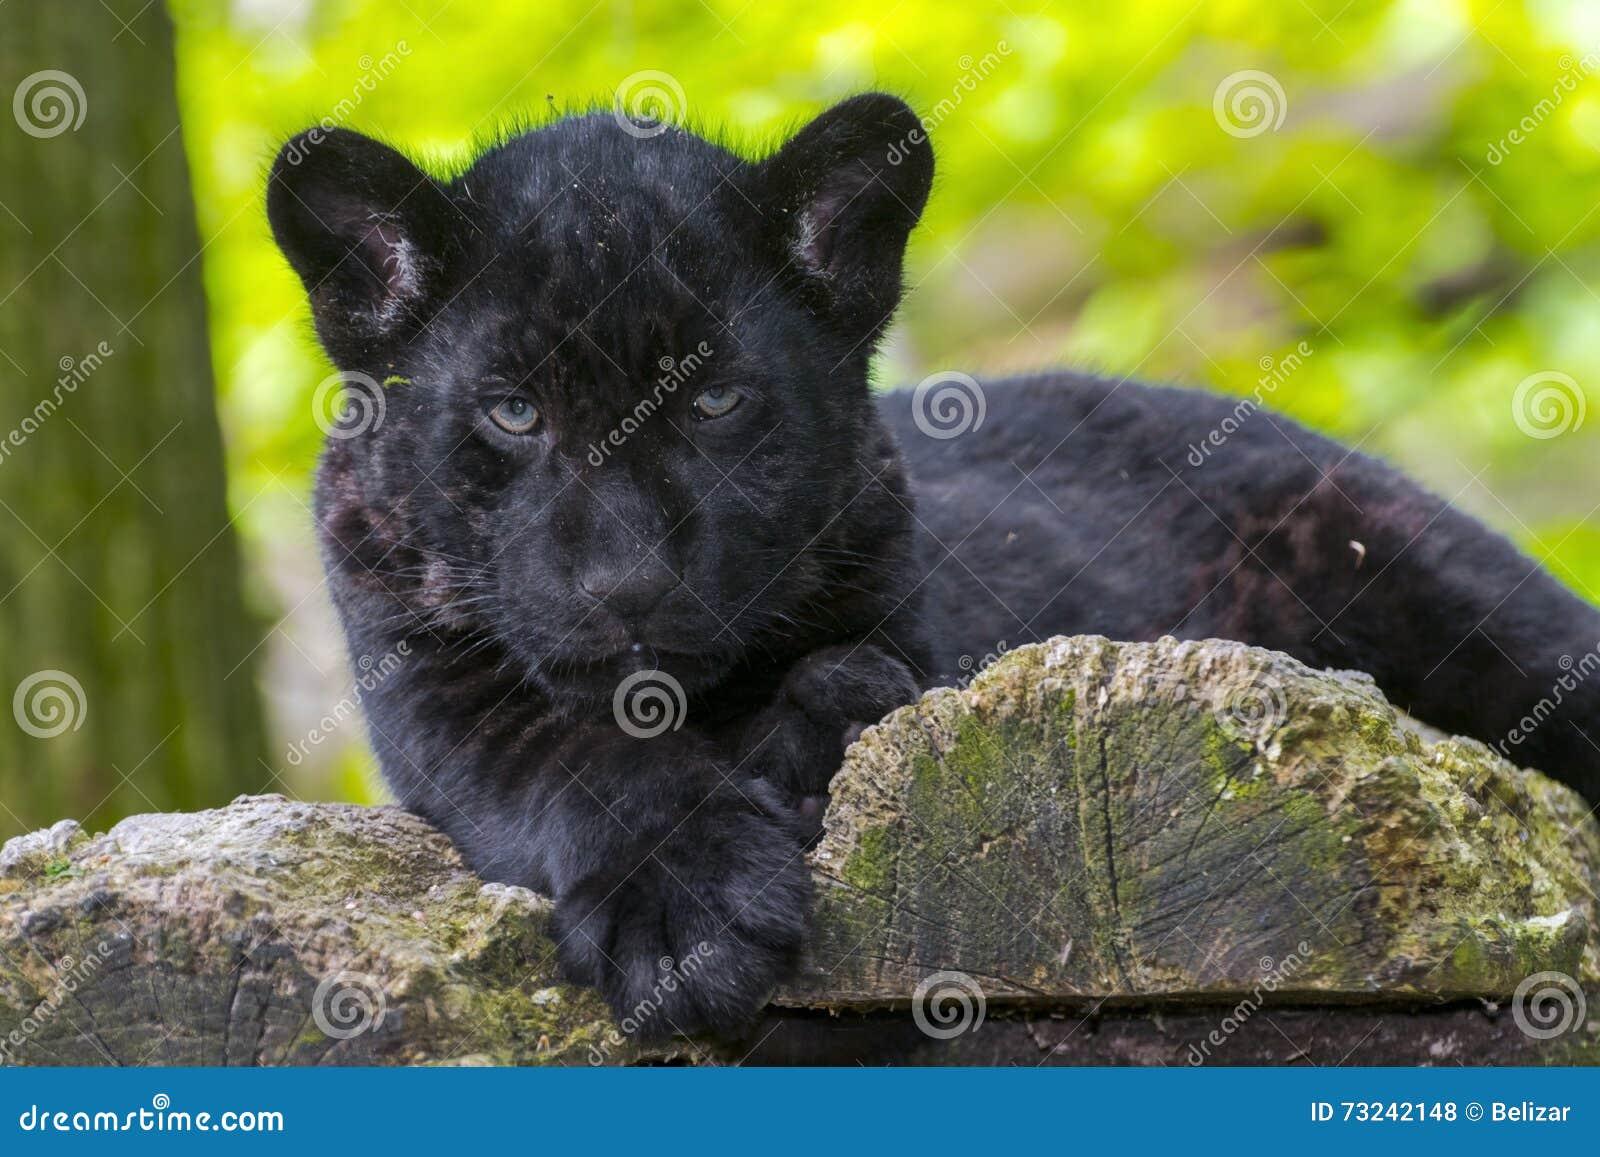 Black Jaguar Cub Stock Photo - Image: 73242148 - photo#19